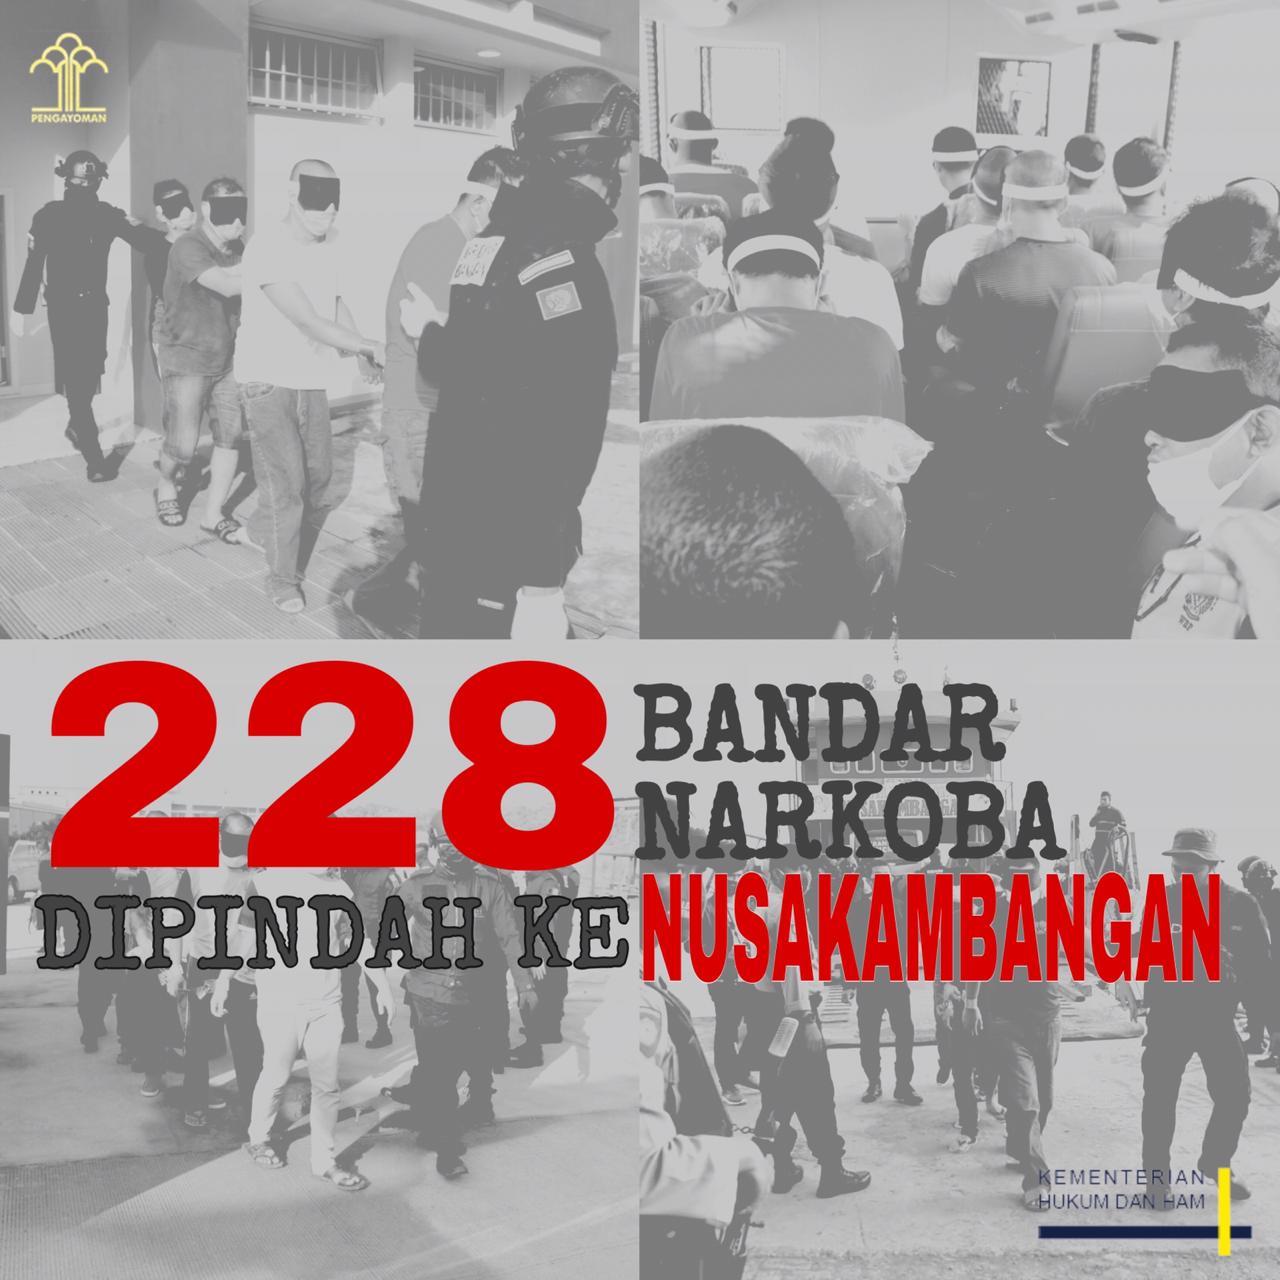 Bersih – Bersih, 228 Bandar Narkotika Dipindahkan ke Nusakambangan